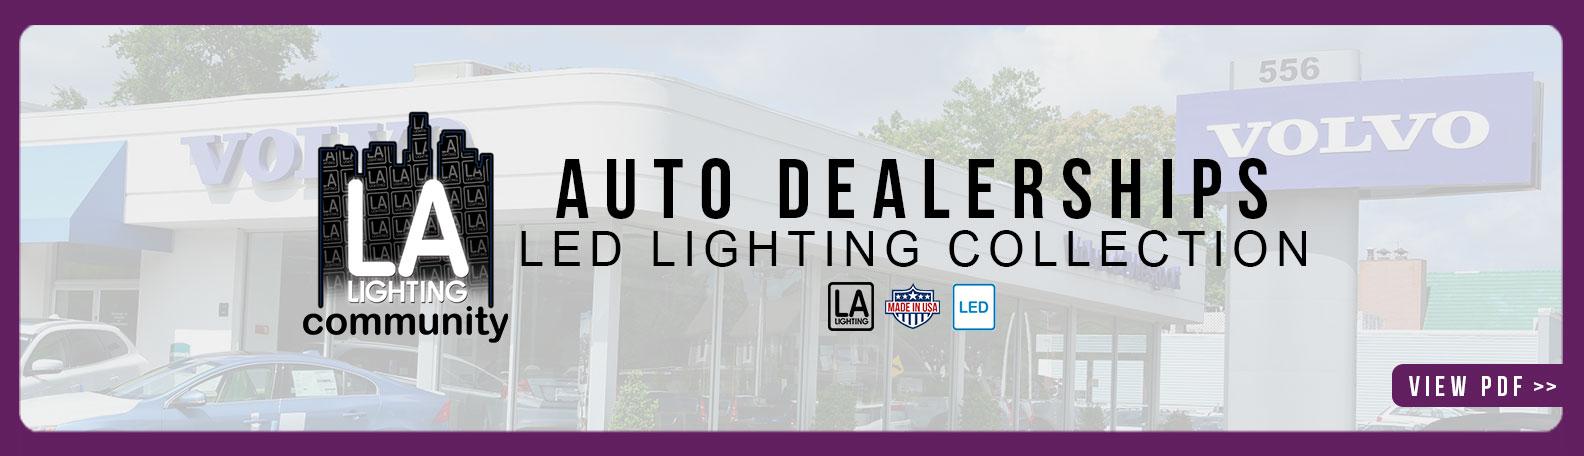 header_MAIN_auto_dealerships